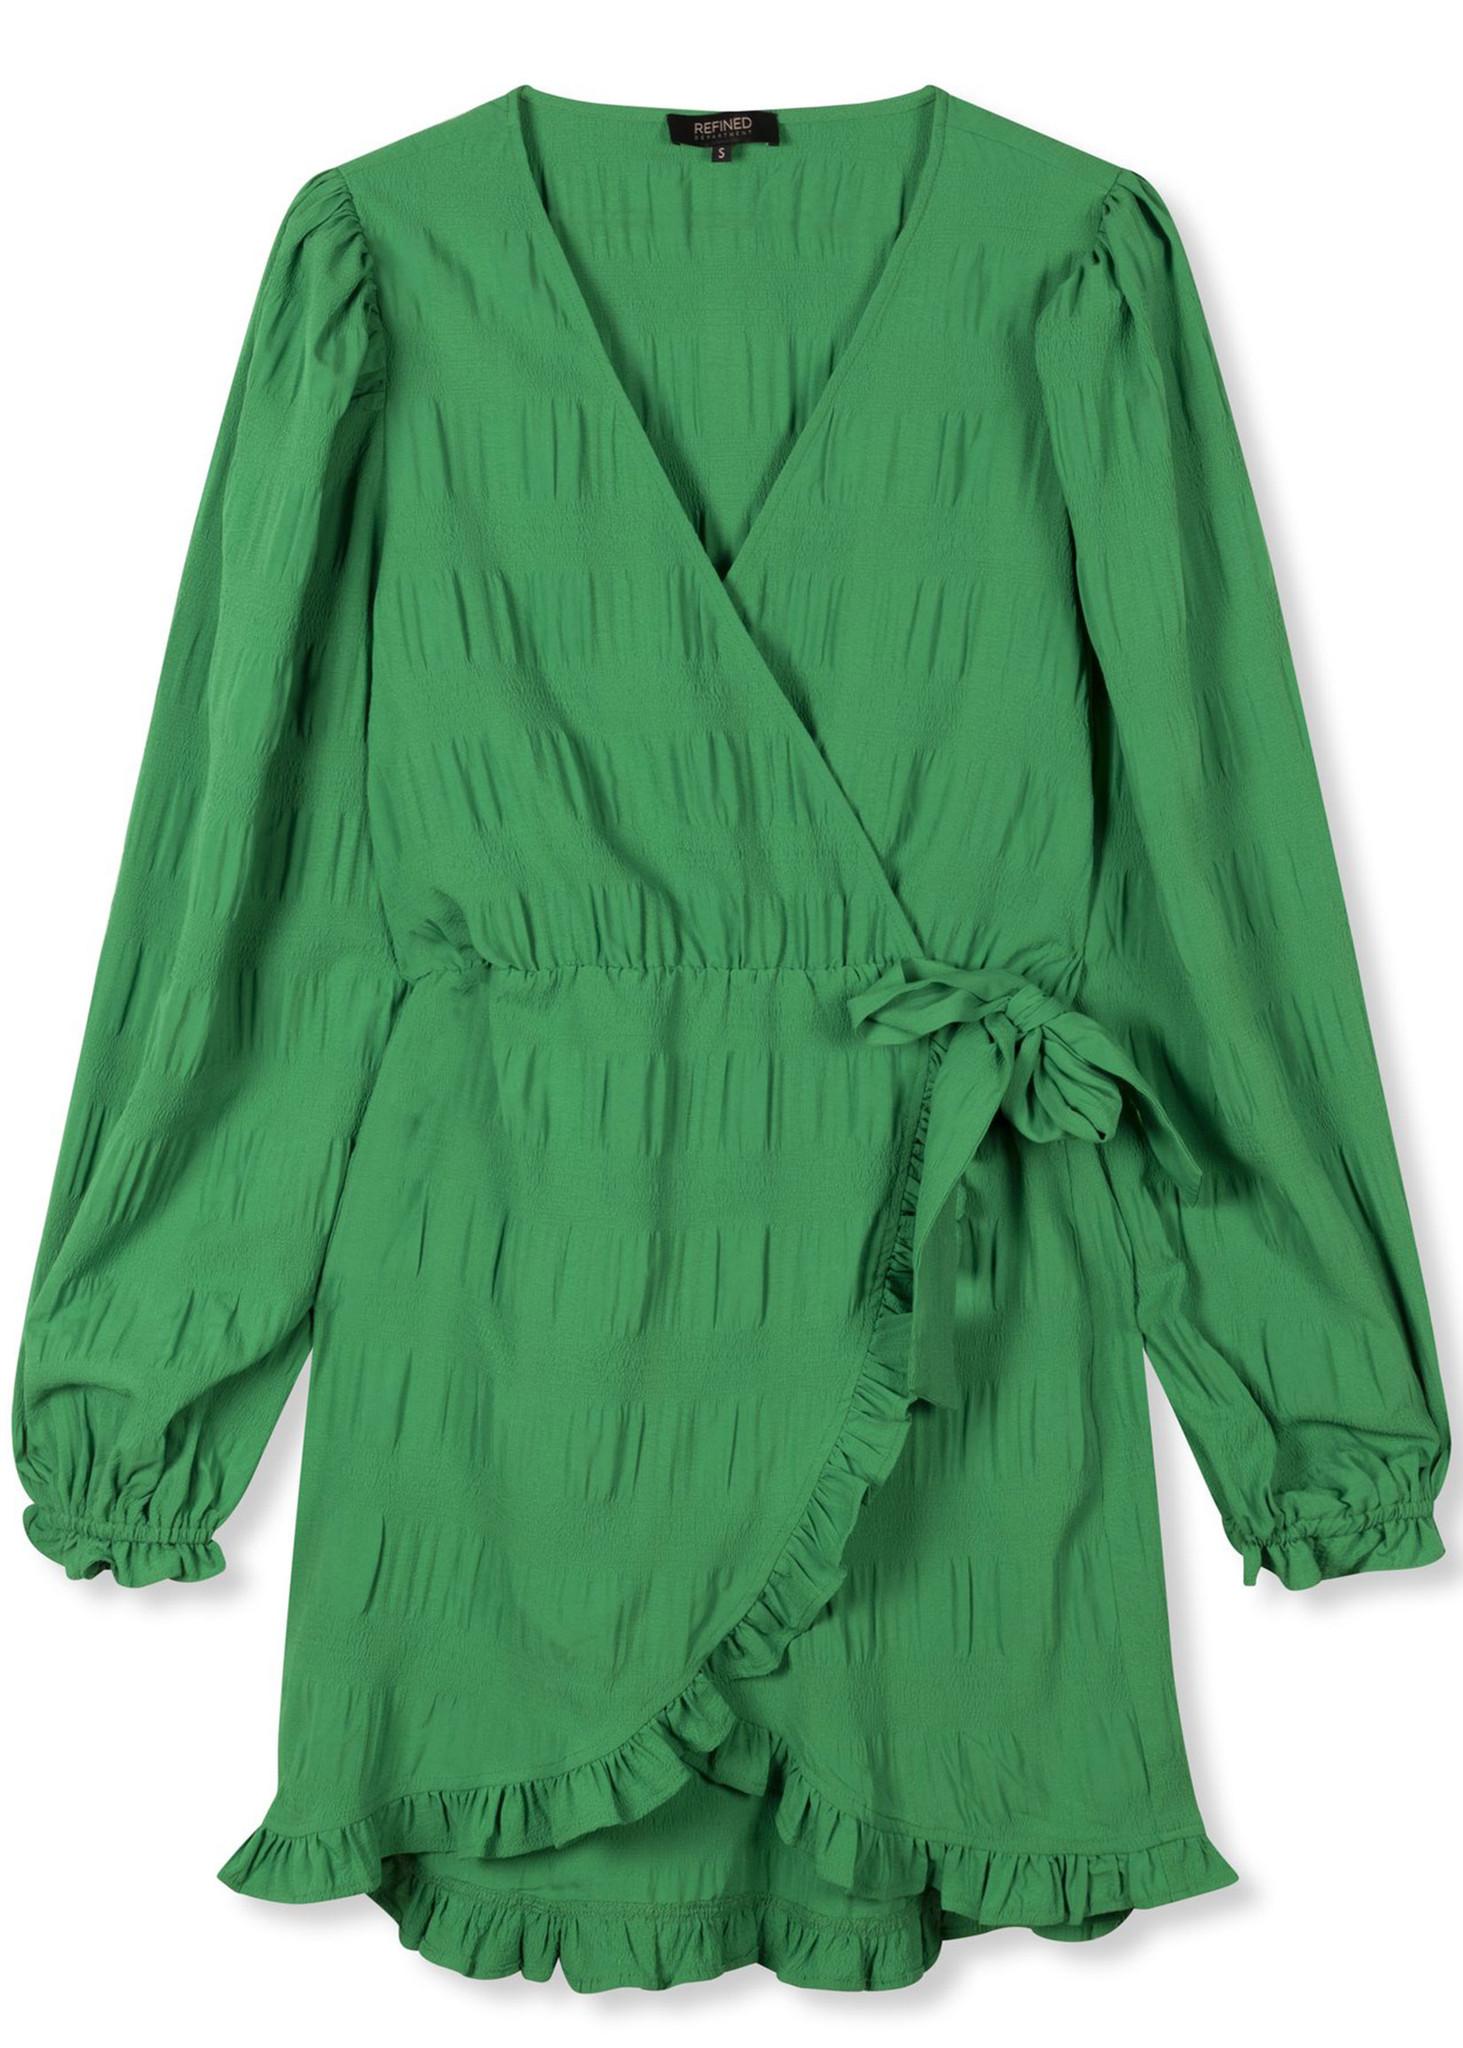 Woven Smock Dress Green-3